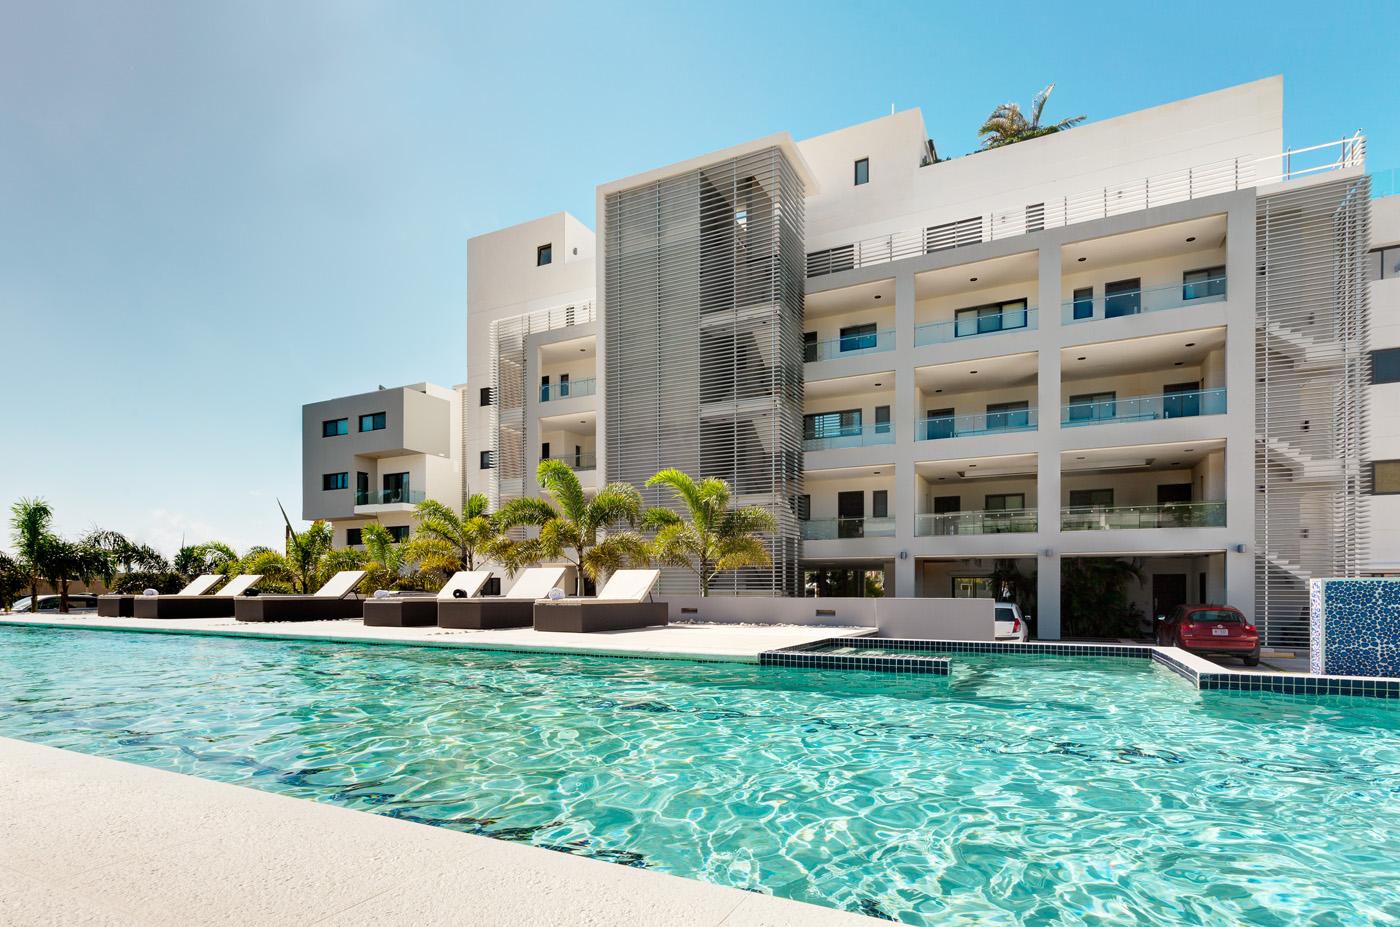 Las Brisas Residence & Marina - 9b5f6-_MG_7521_2_3_fused.jpg